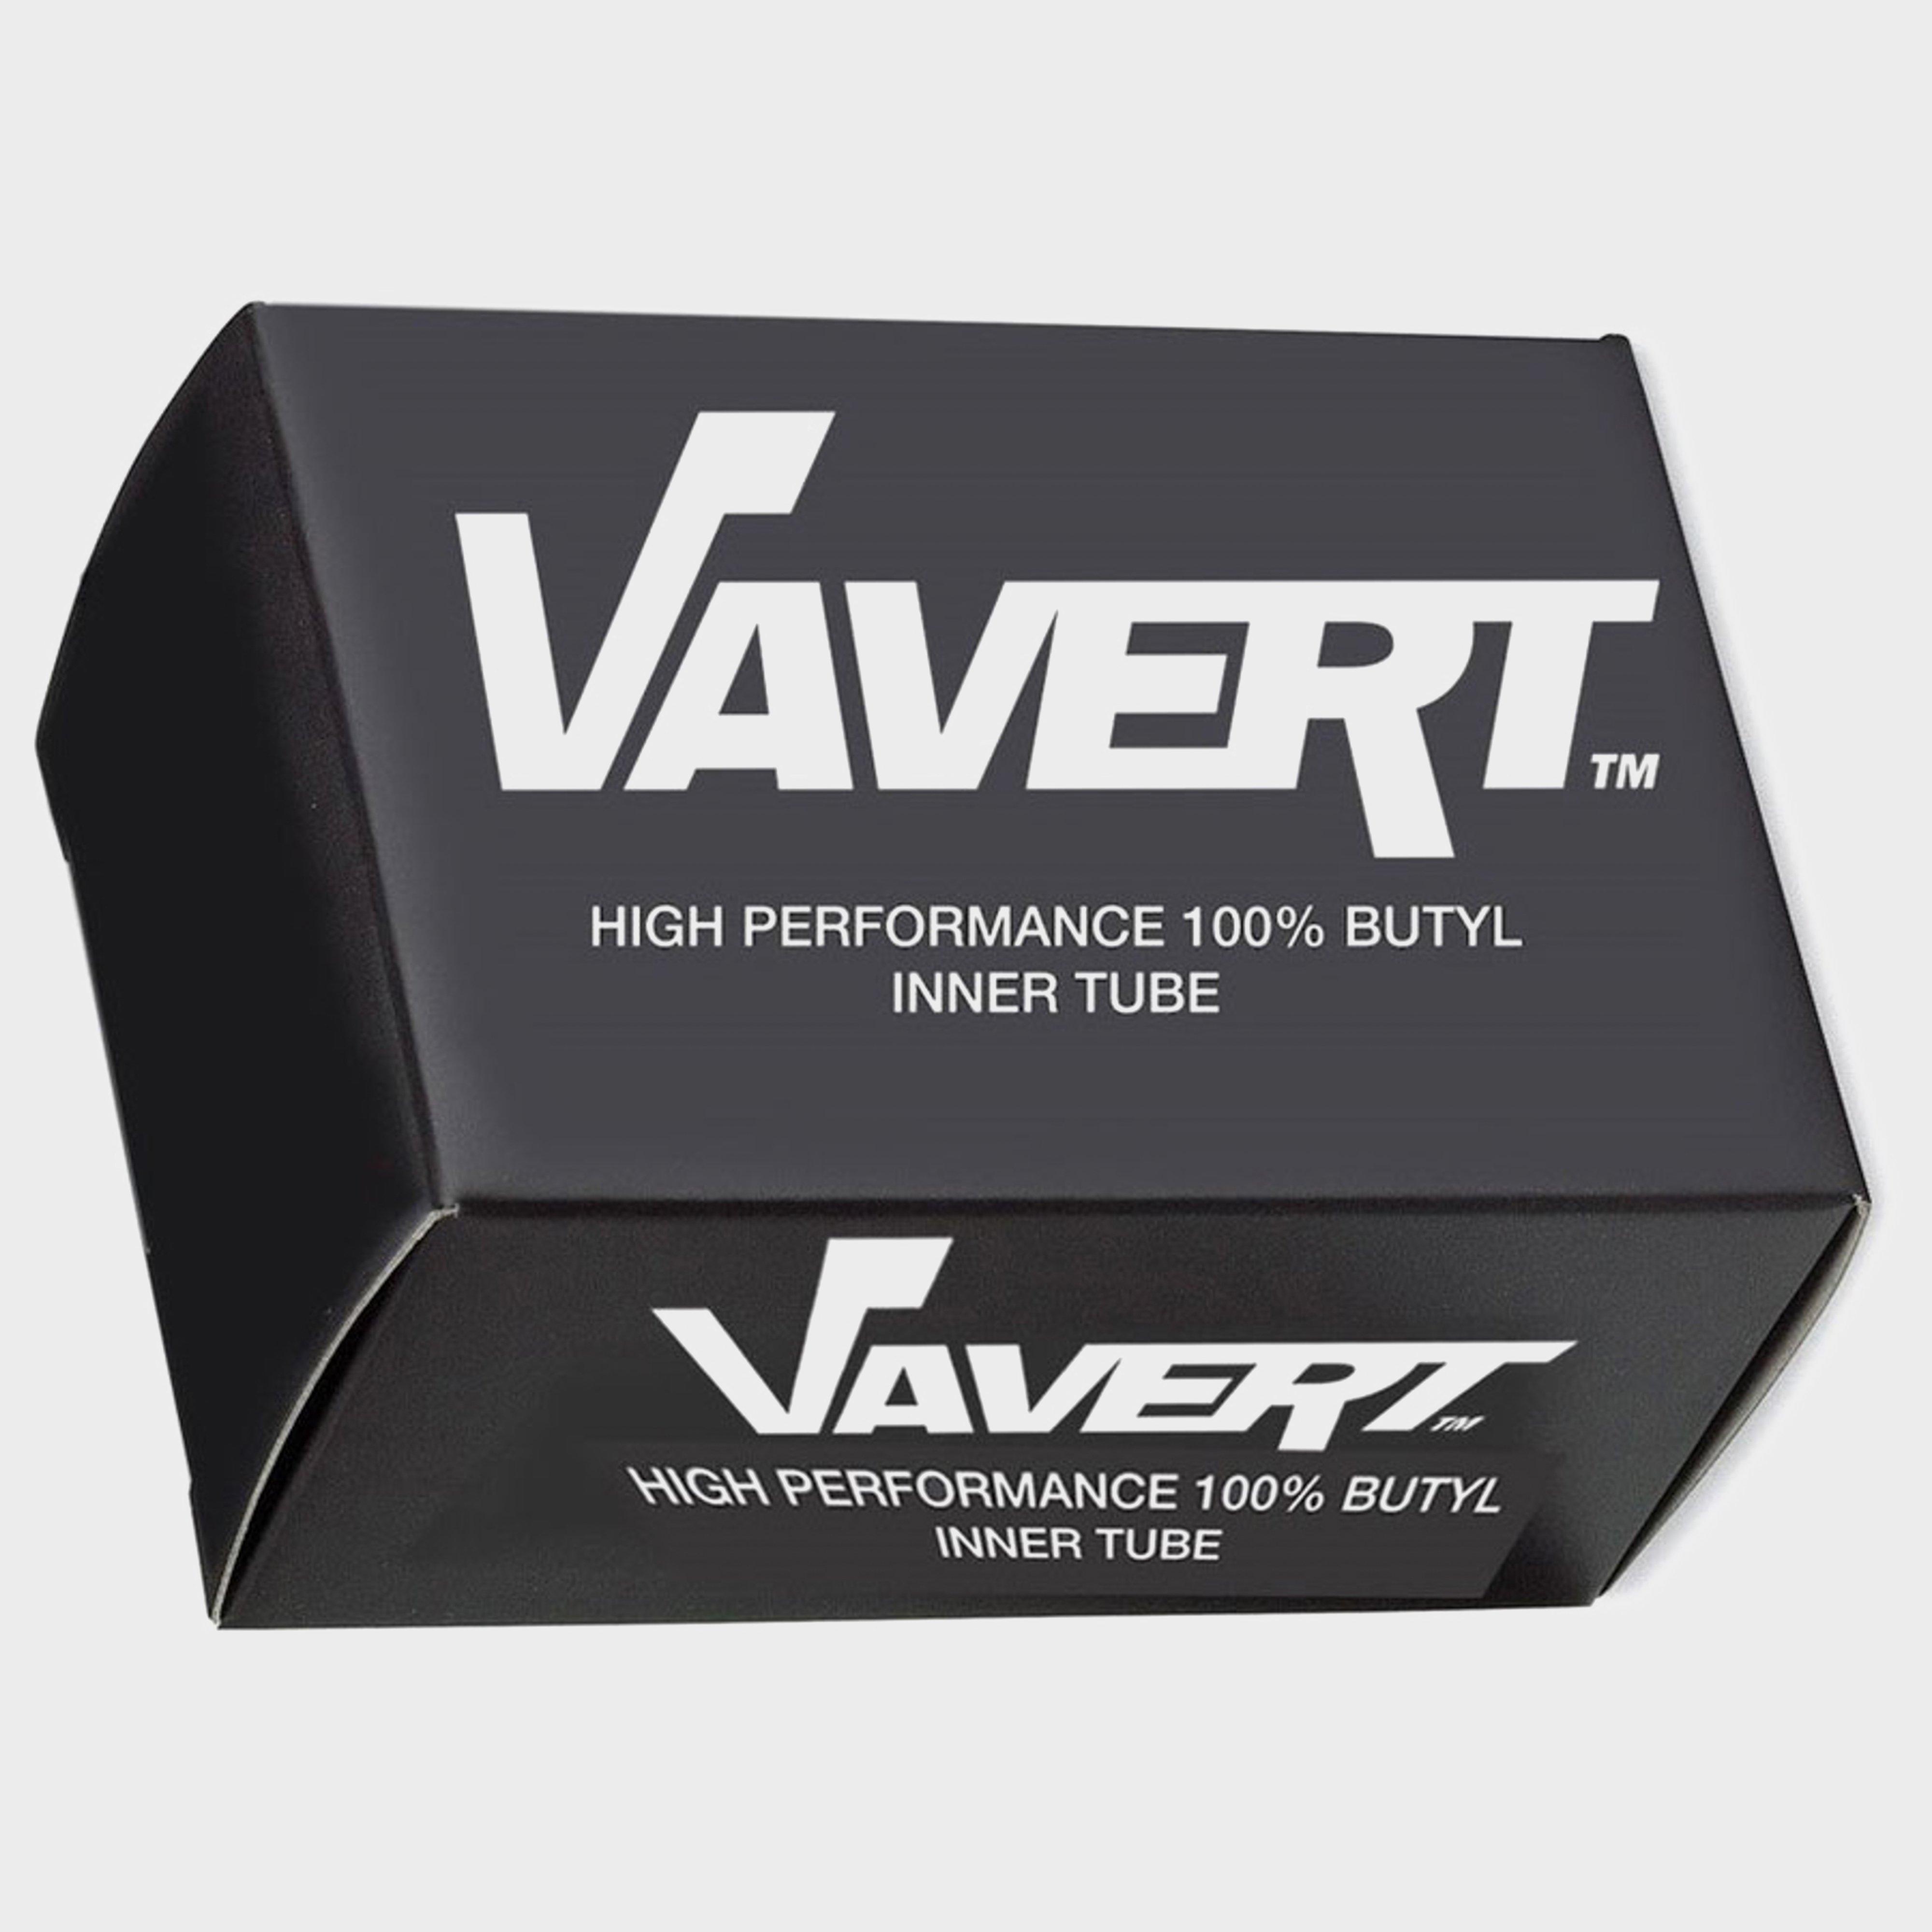 Vavert 20 X 1.75 X - Black/1.95  Black/1.95